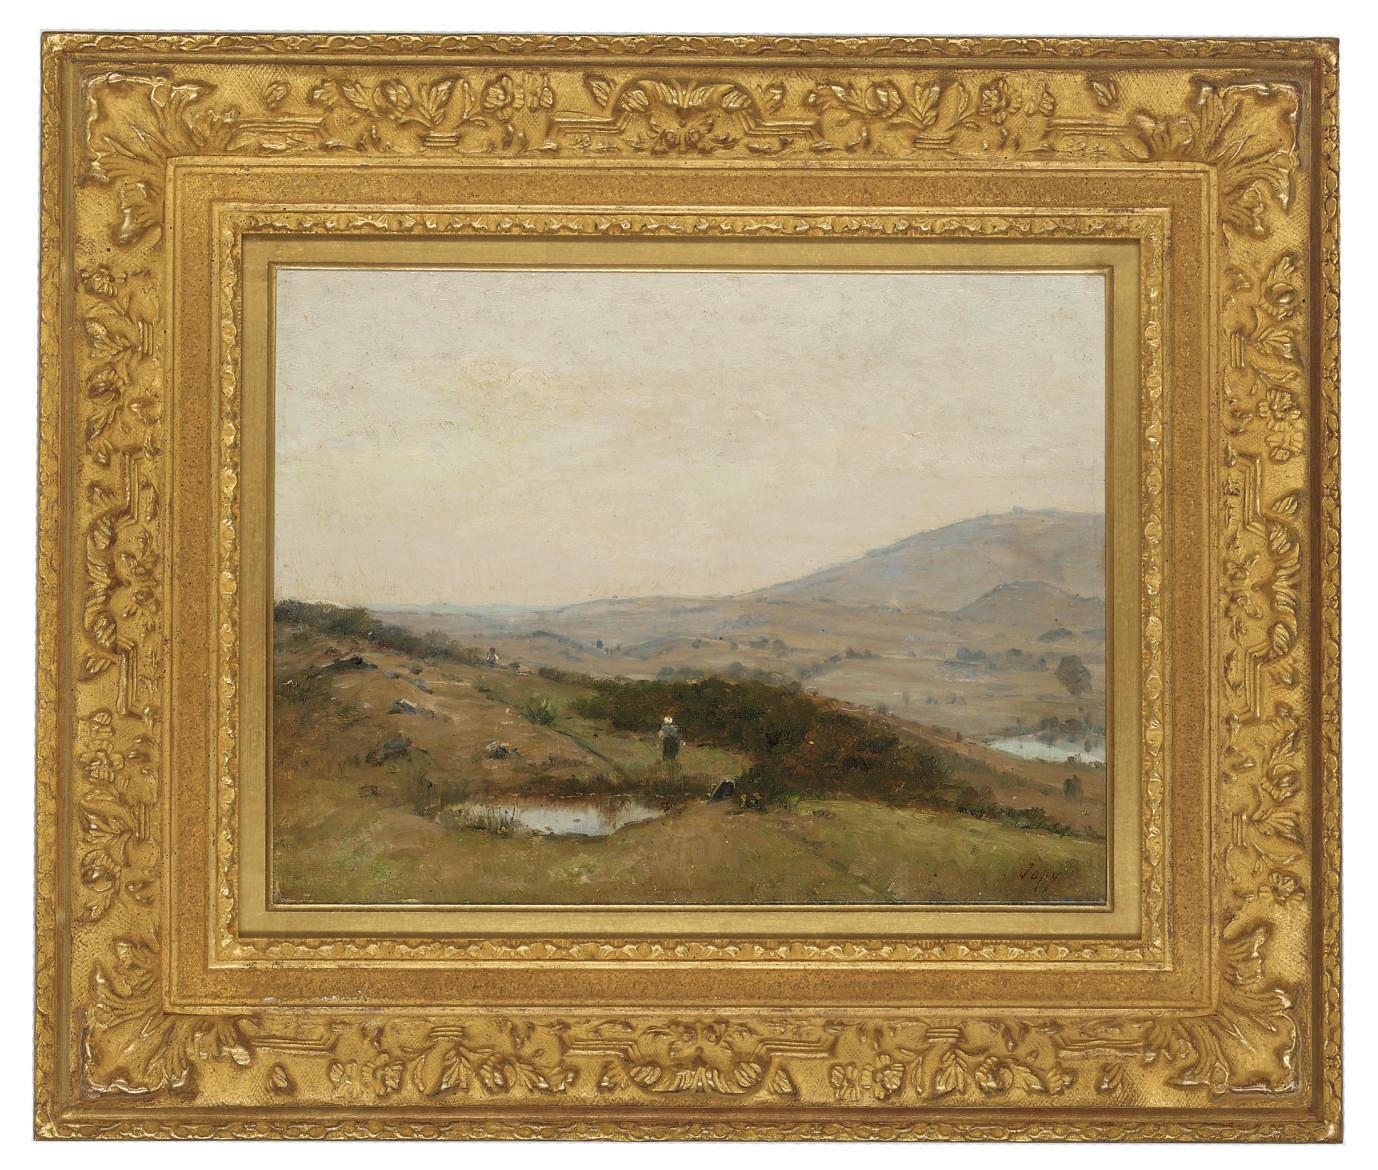 Louis-Aime Japy (Swiss, 1840-1